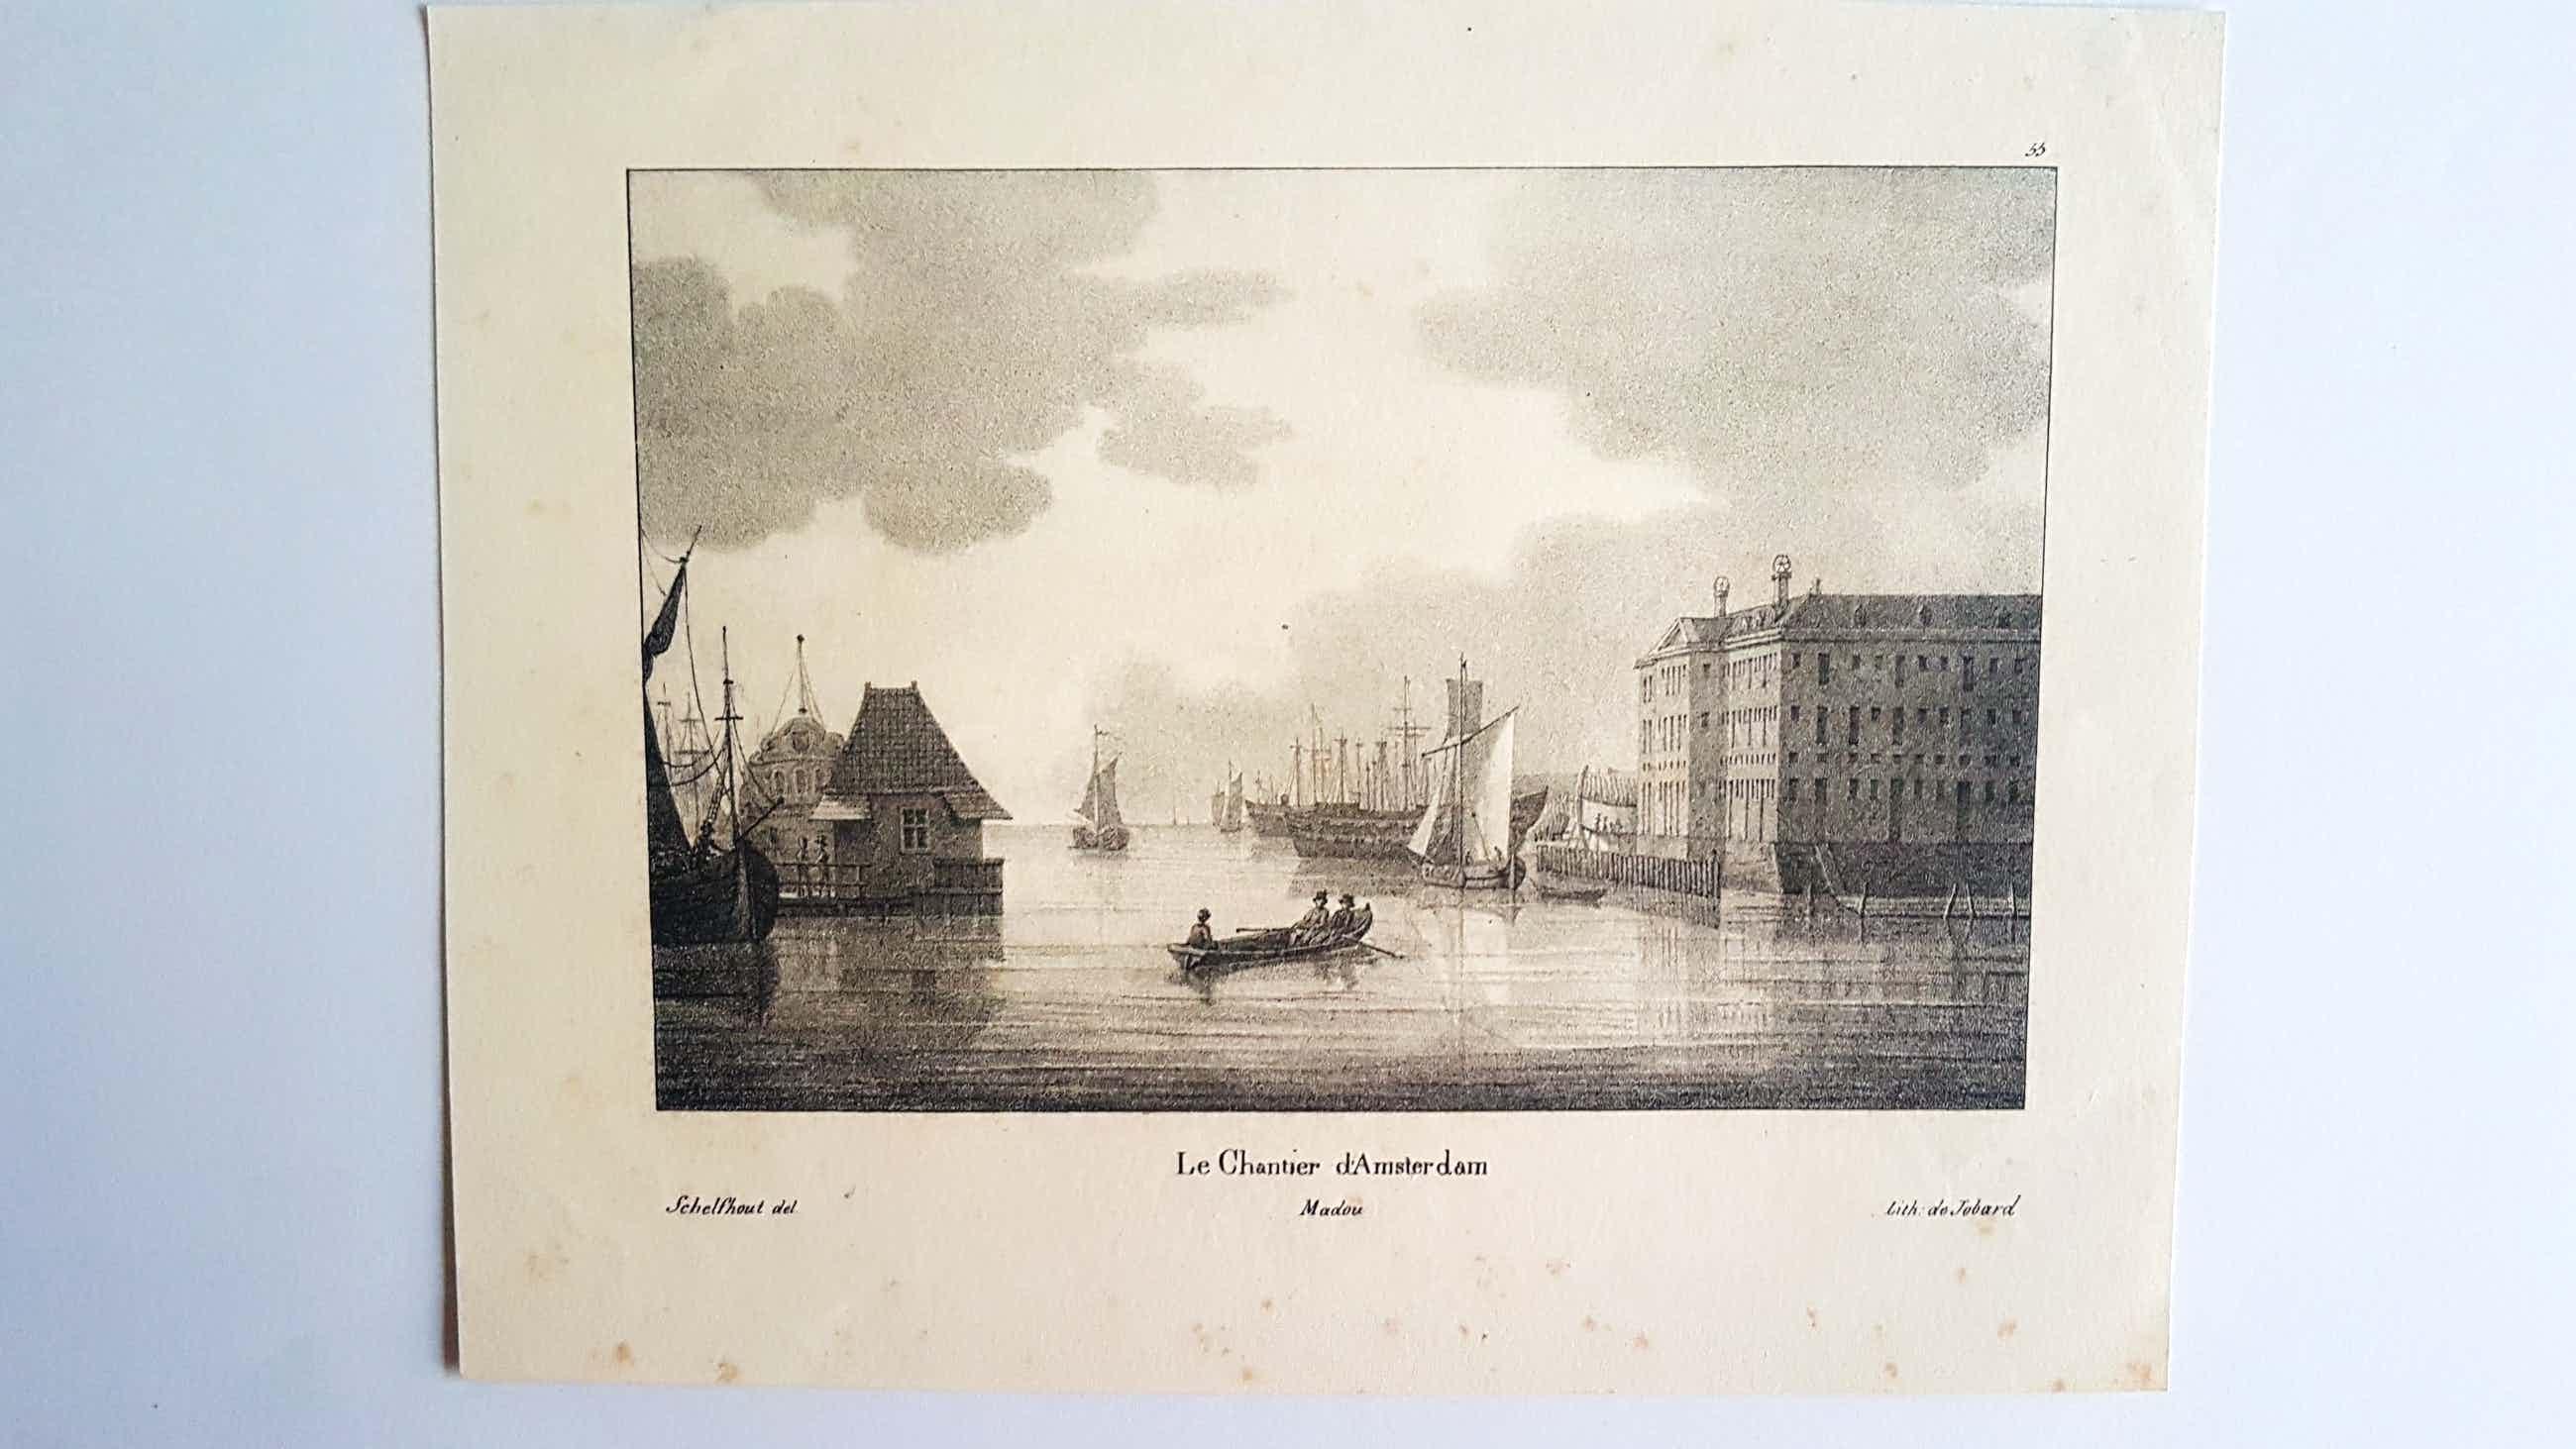 Jean Baptiste Ambroise Marcellin Jobard - Le chantier d'Amsterdam kopen? Bied vanaf 20!